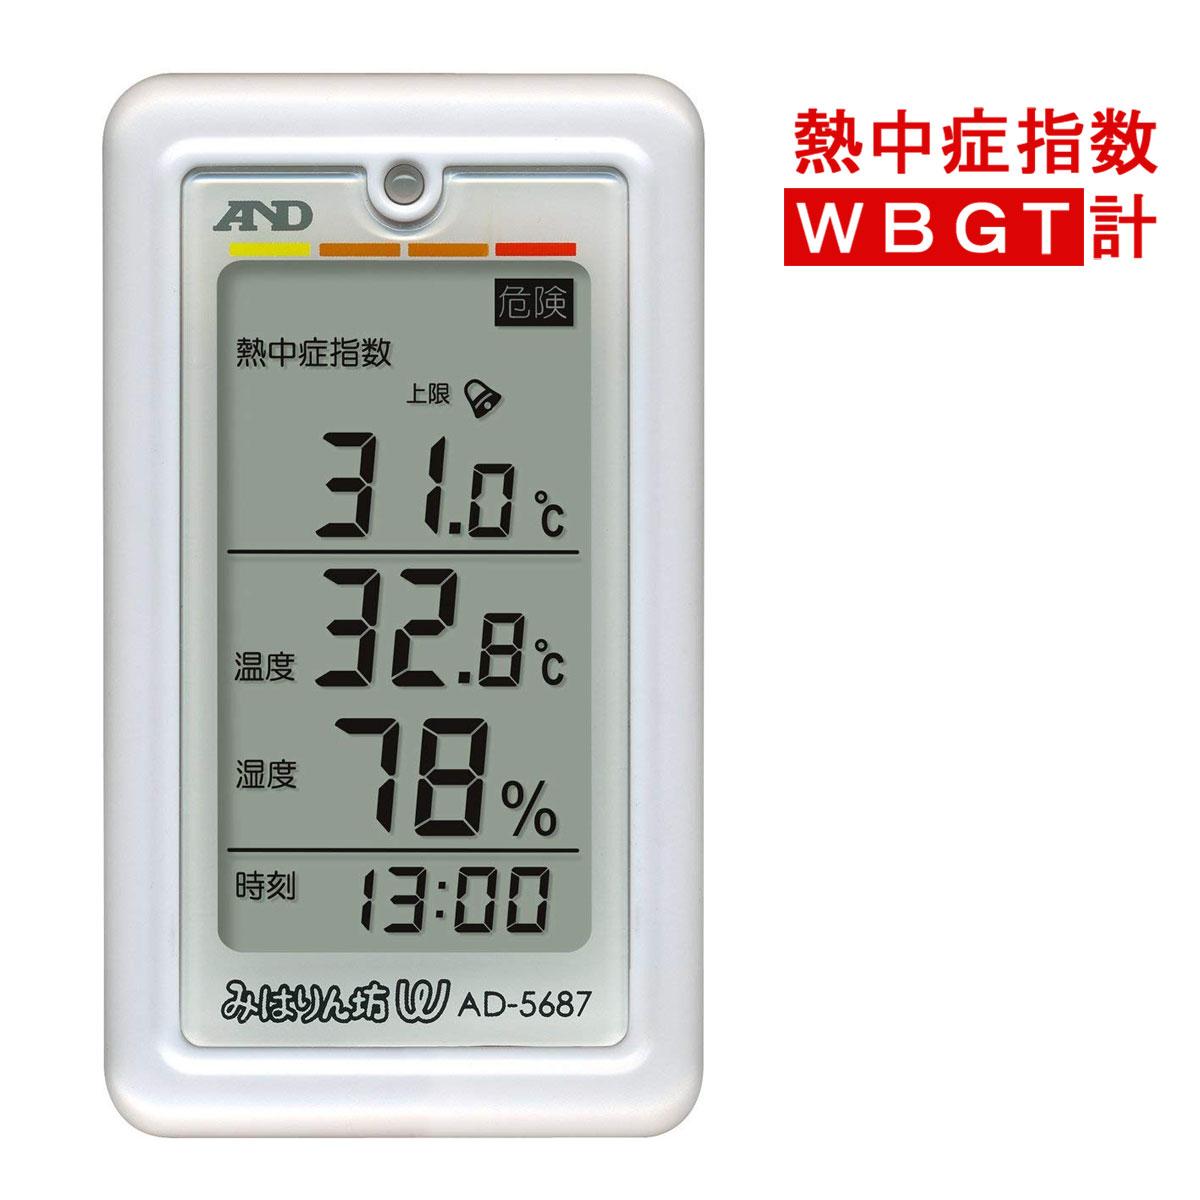 WBGT計:携帯型熱中症指数モニター&インフルエンザ計AD-5687【メール便可¥320】